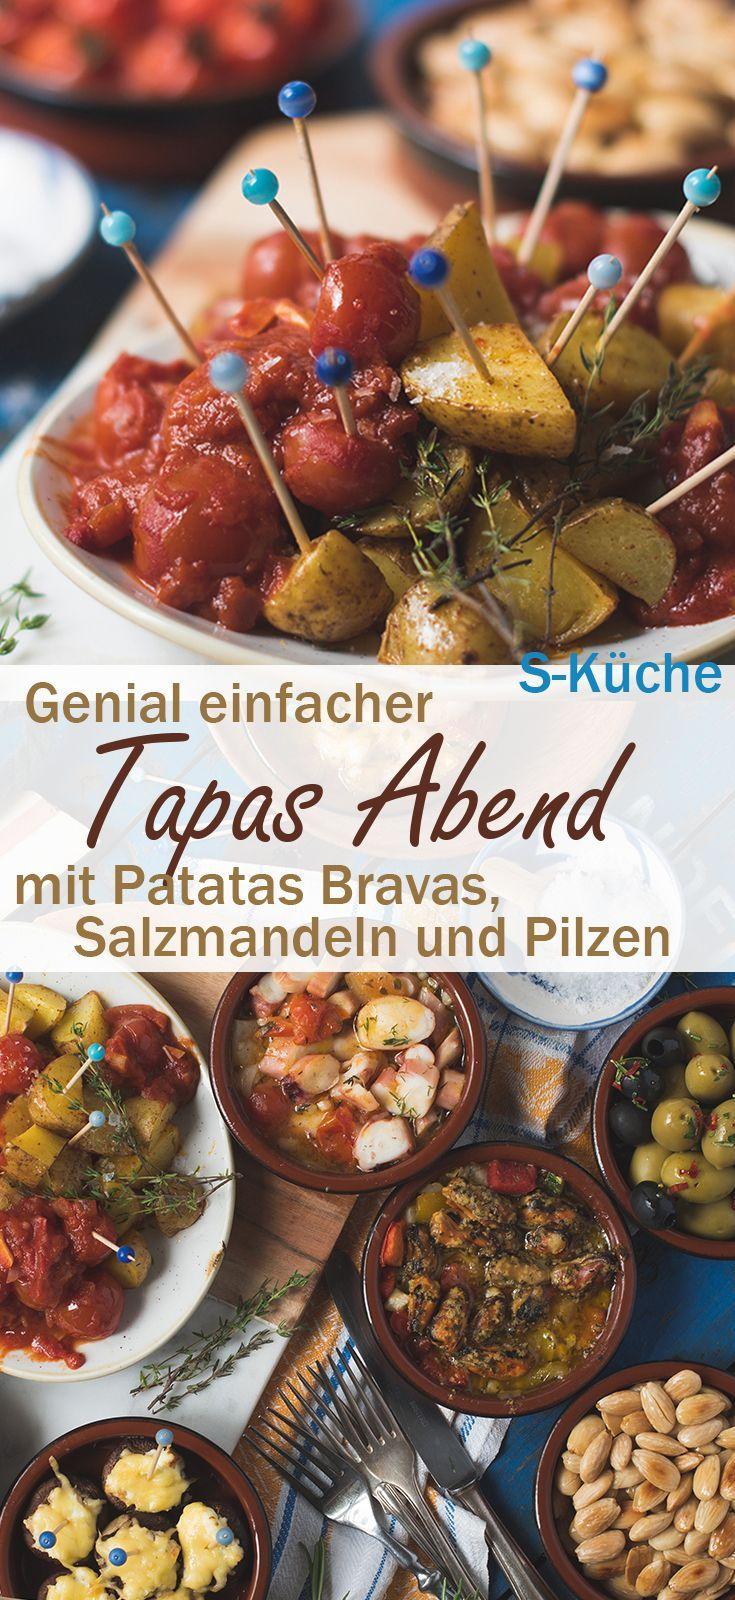 Genial einfacher Tapas Abend, Frutti di Mare, Patatas Bravas, Salzmandel